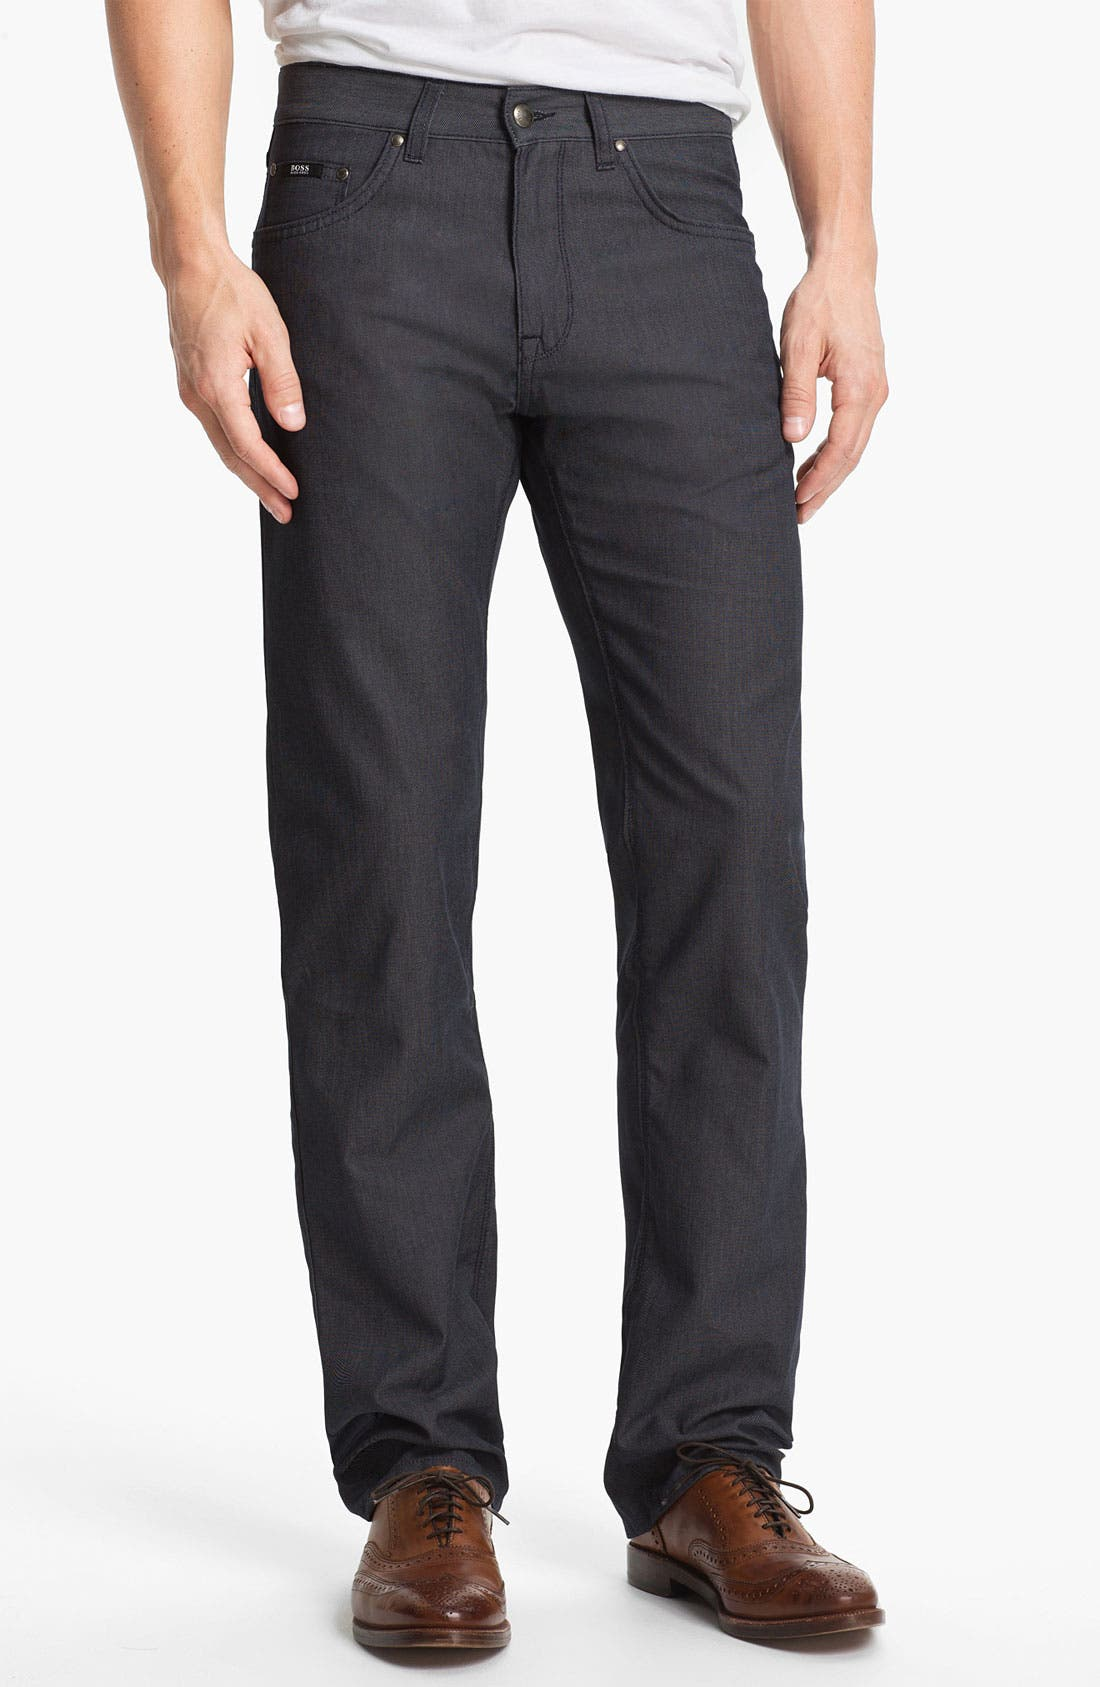 Alternate Image 1 Selected - BOSS HUGO BOSS 'Maine' Straight Leg Five Pocket Pants